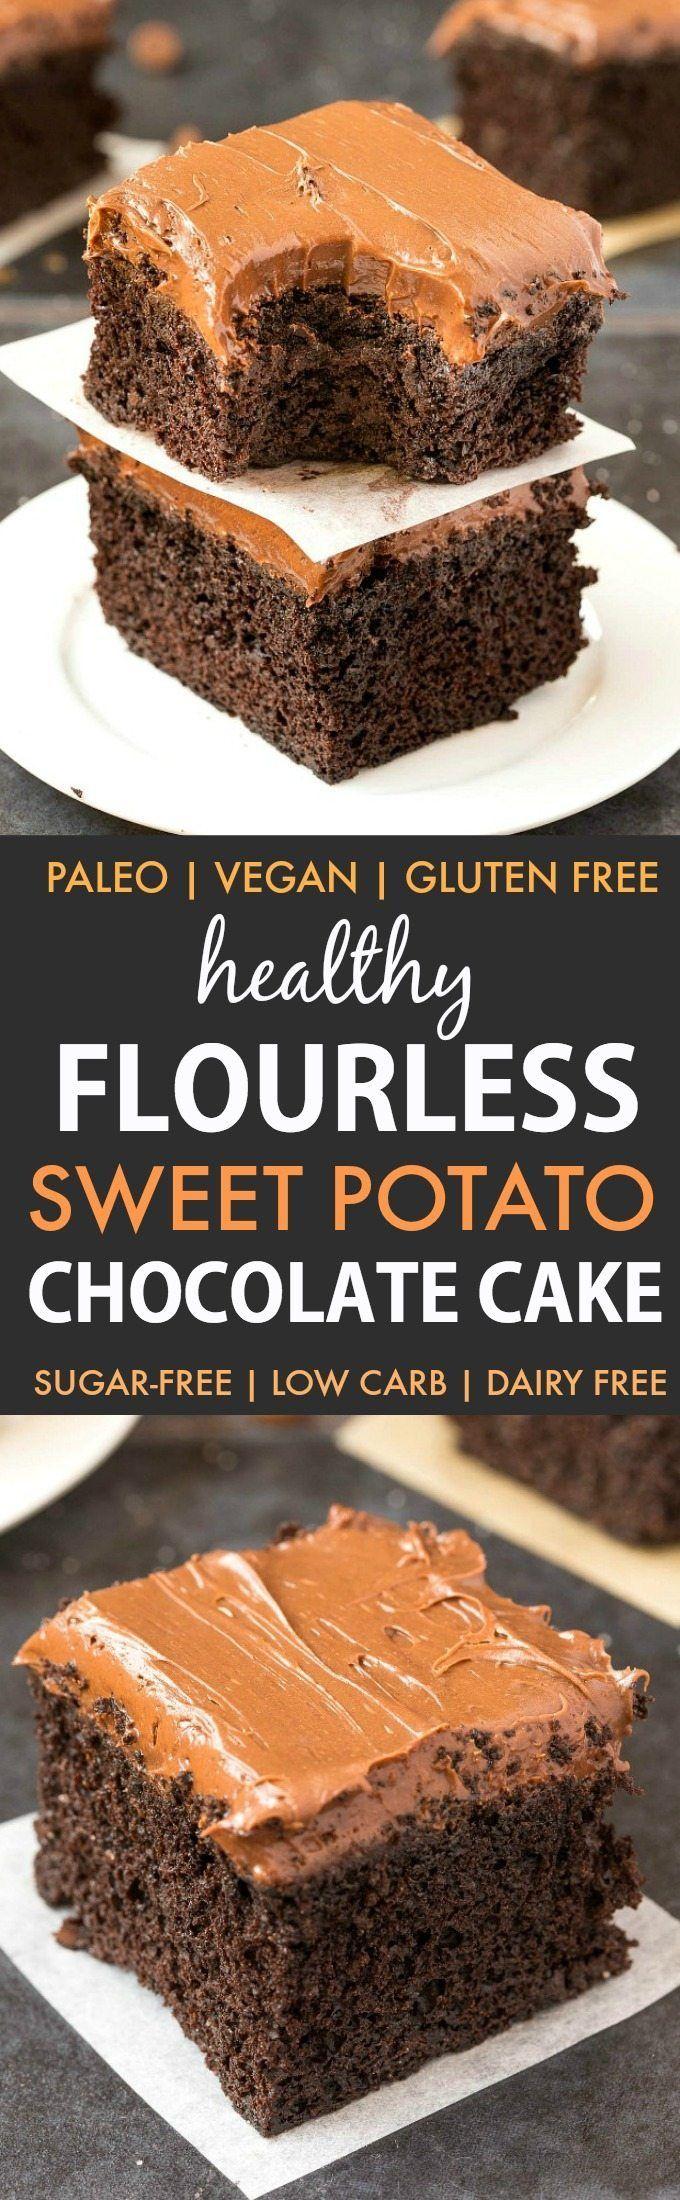 Best 25+ Gluten free ideas on Pinterest | Gluton free ...